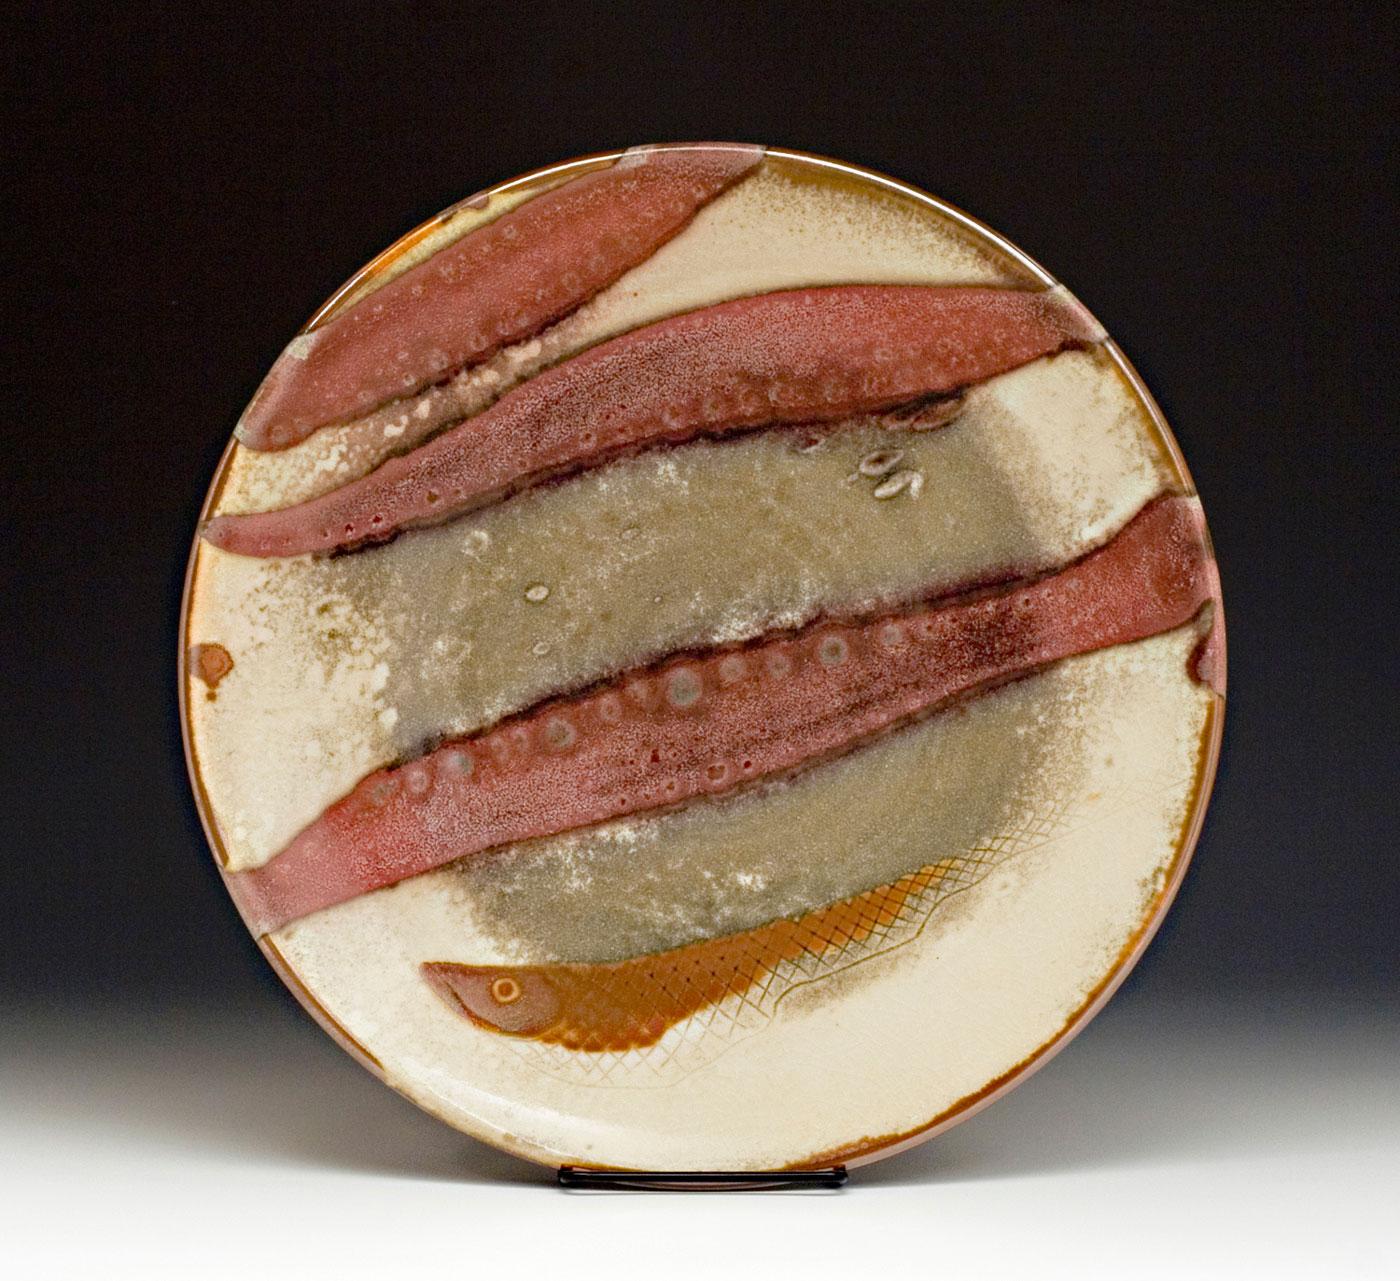 Bruce-Gholson-Shino-Plate-Bulldog-Pottery.jpg